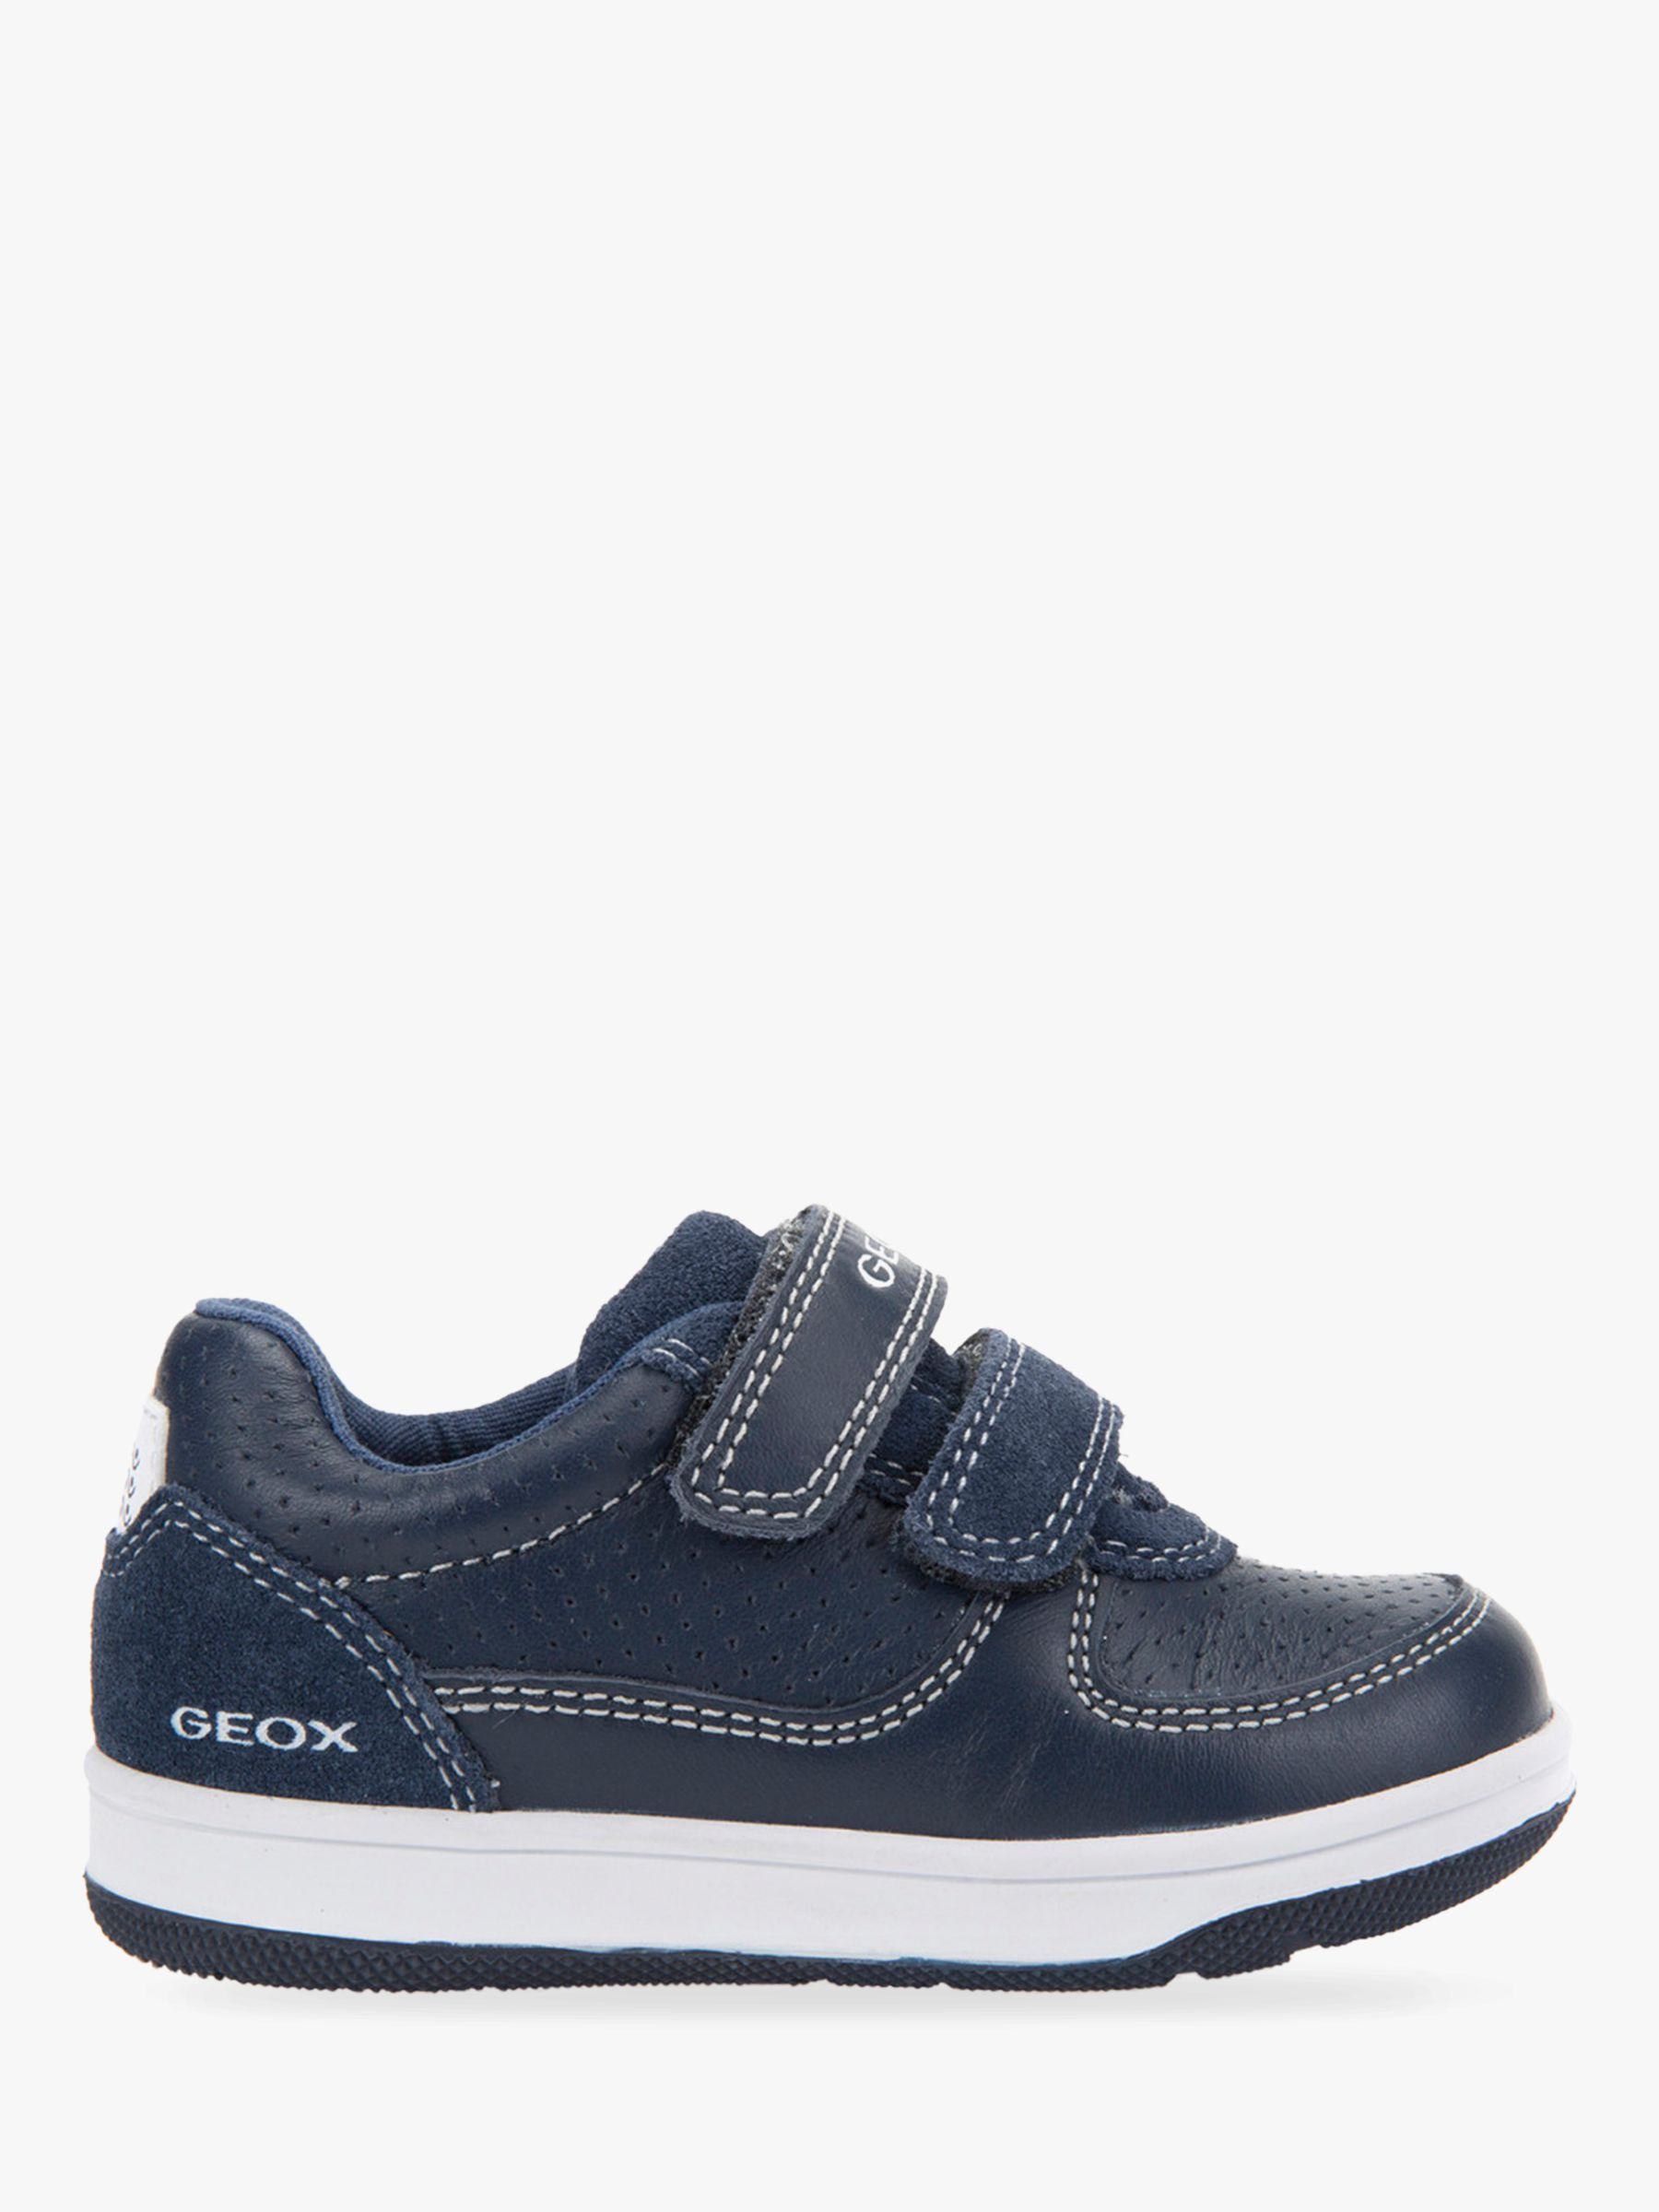 Geox Kids B New Flick B741HF | Shoes International